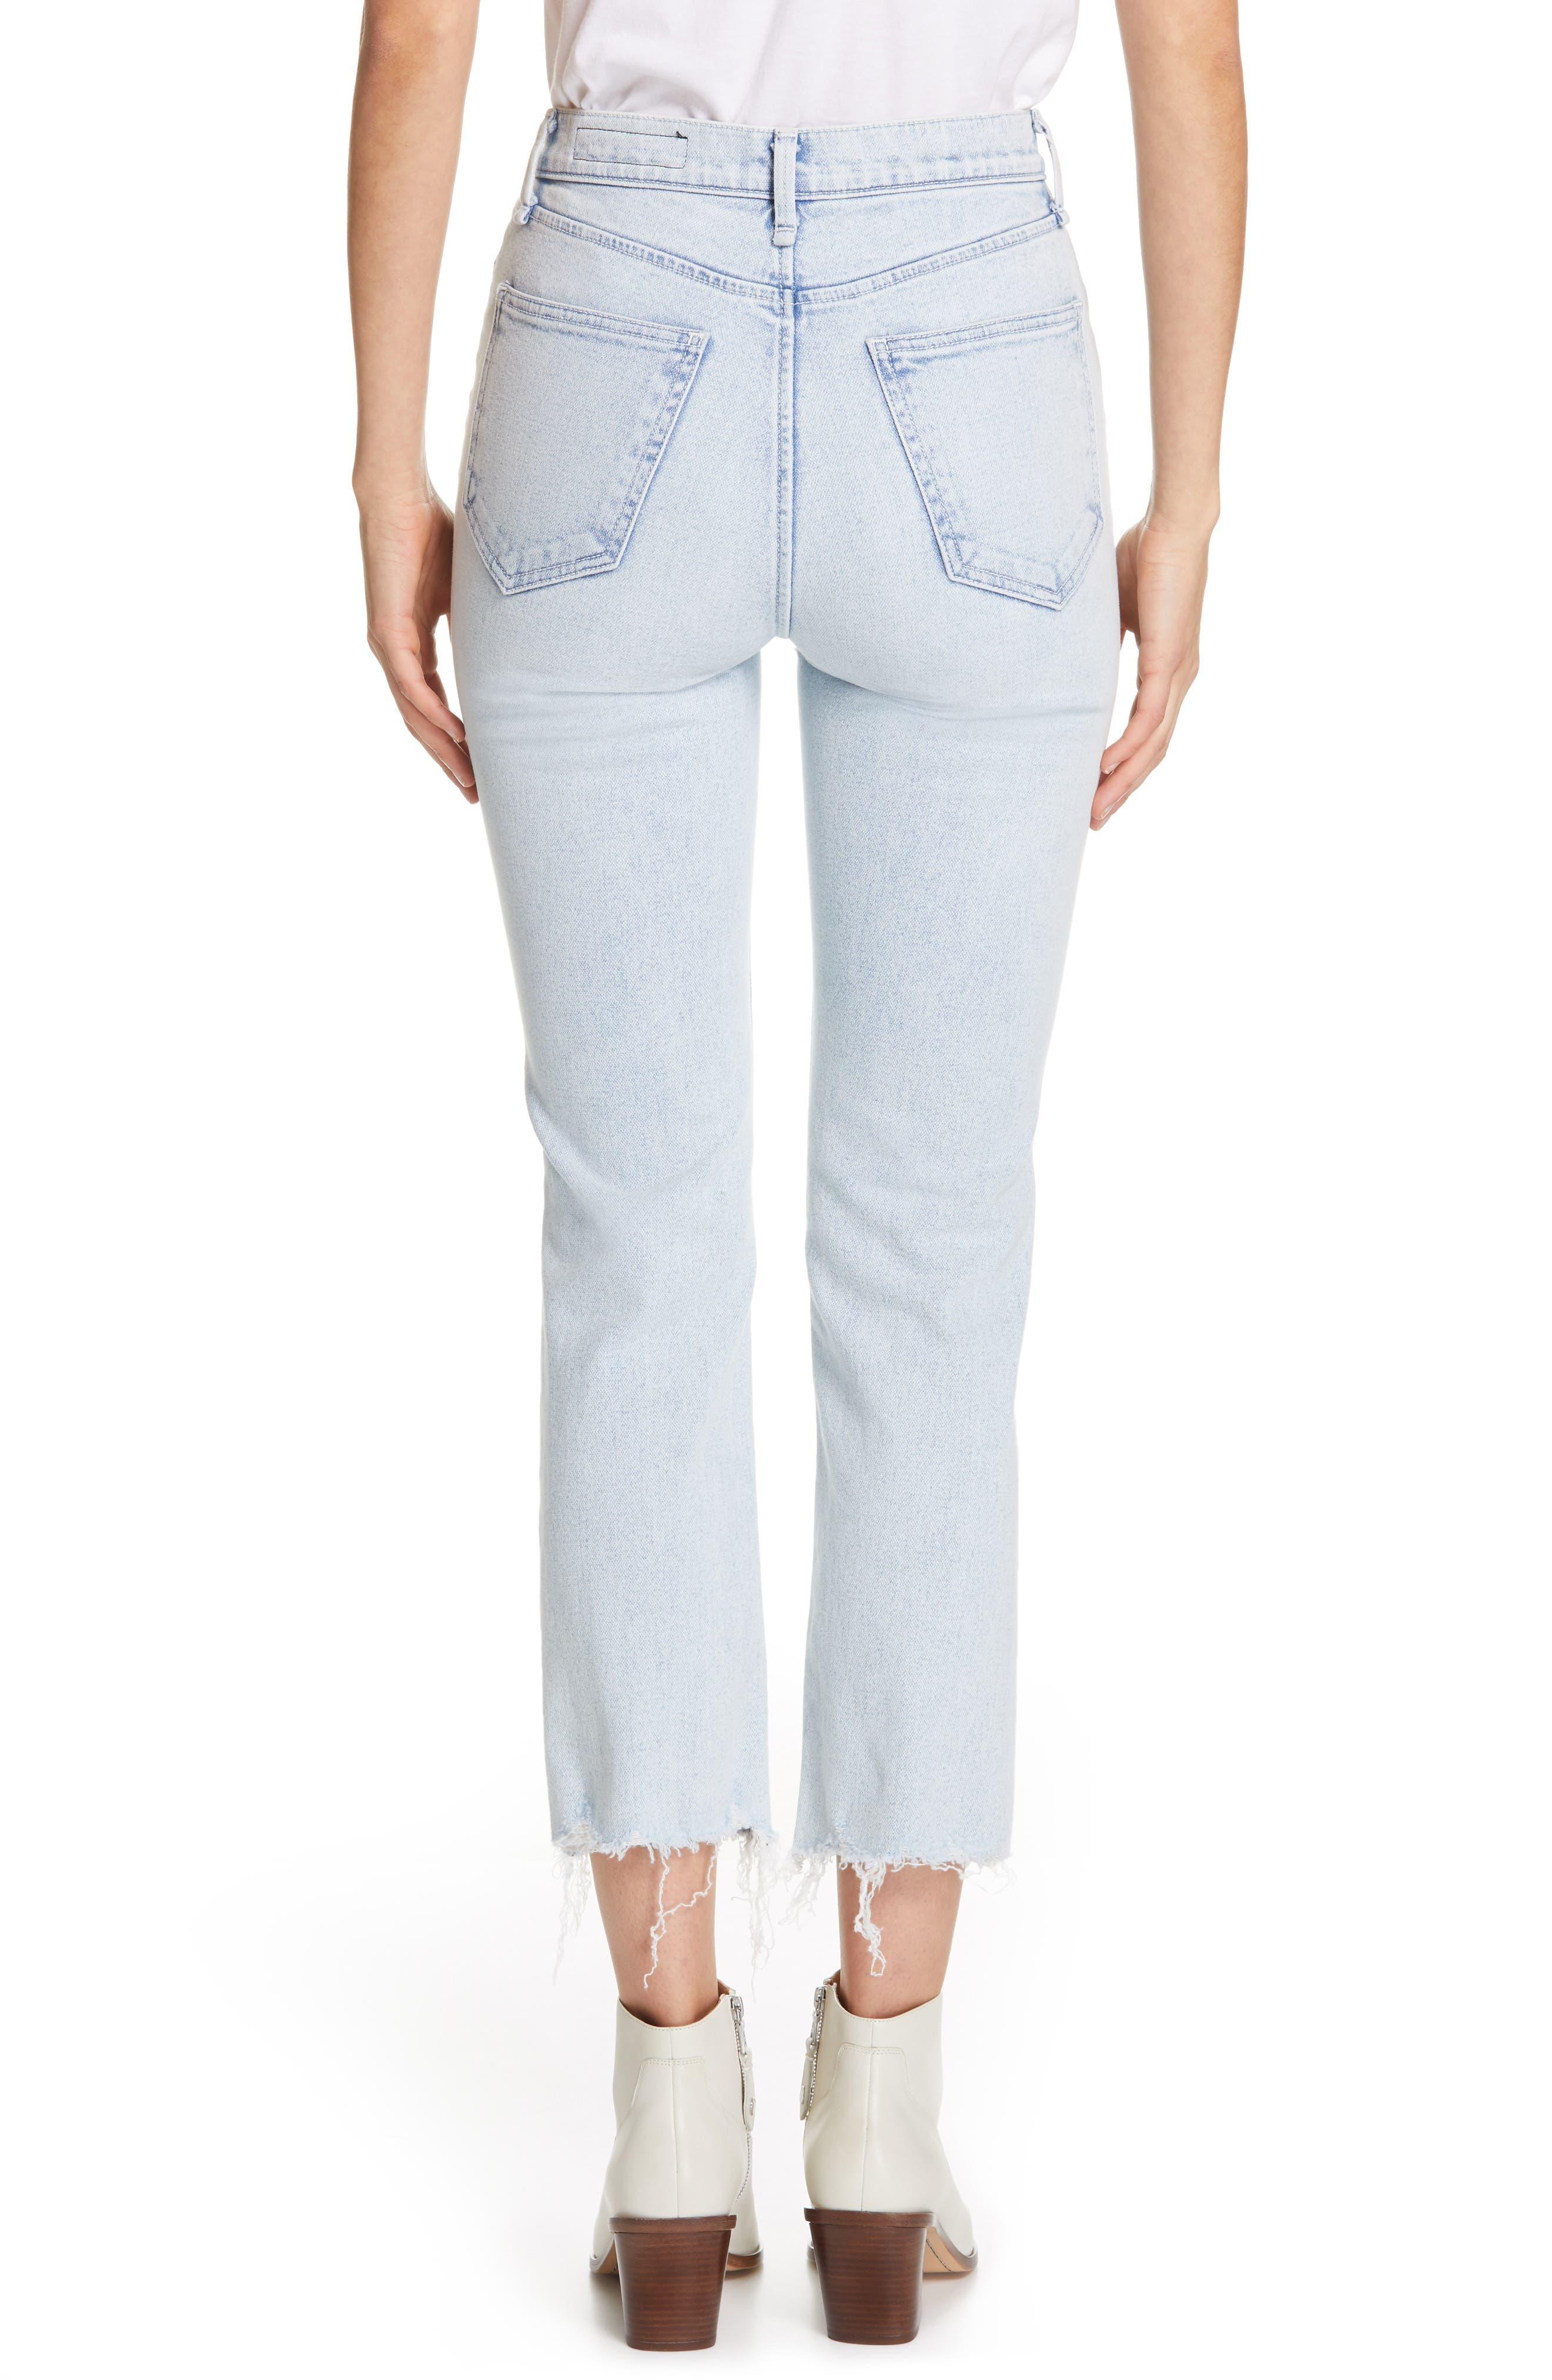 RAG & BONE, JEAN High Waist Ripped Ankle Cigarette Jeans, Alternate thumbnail 2, color, 450